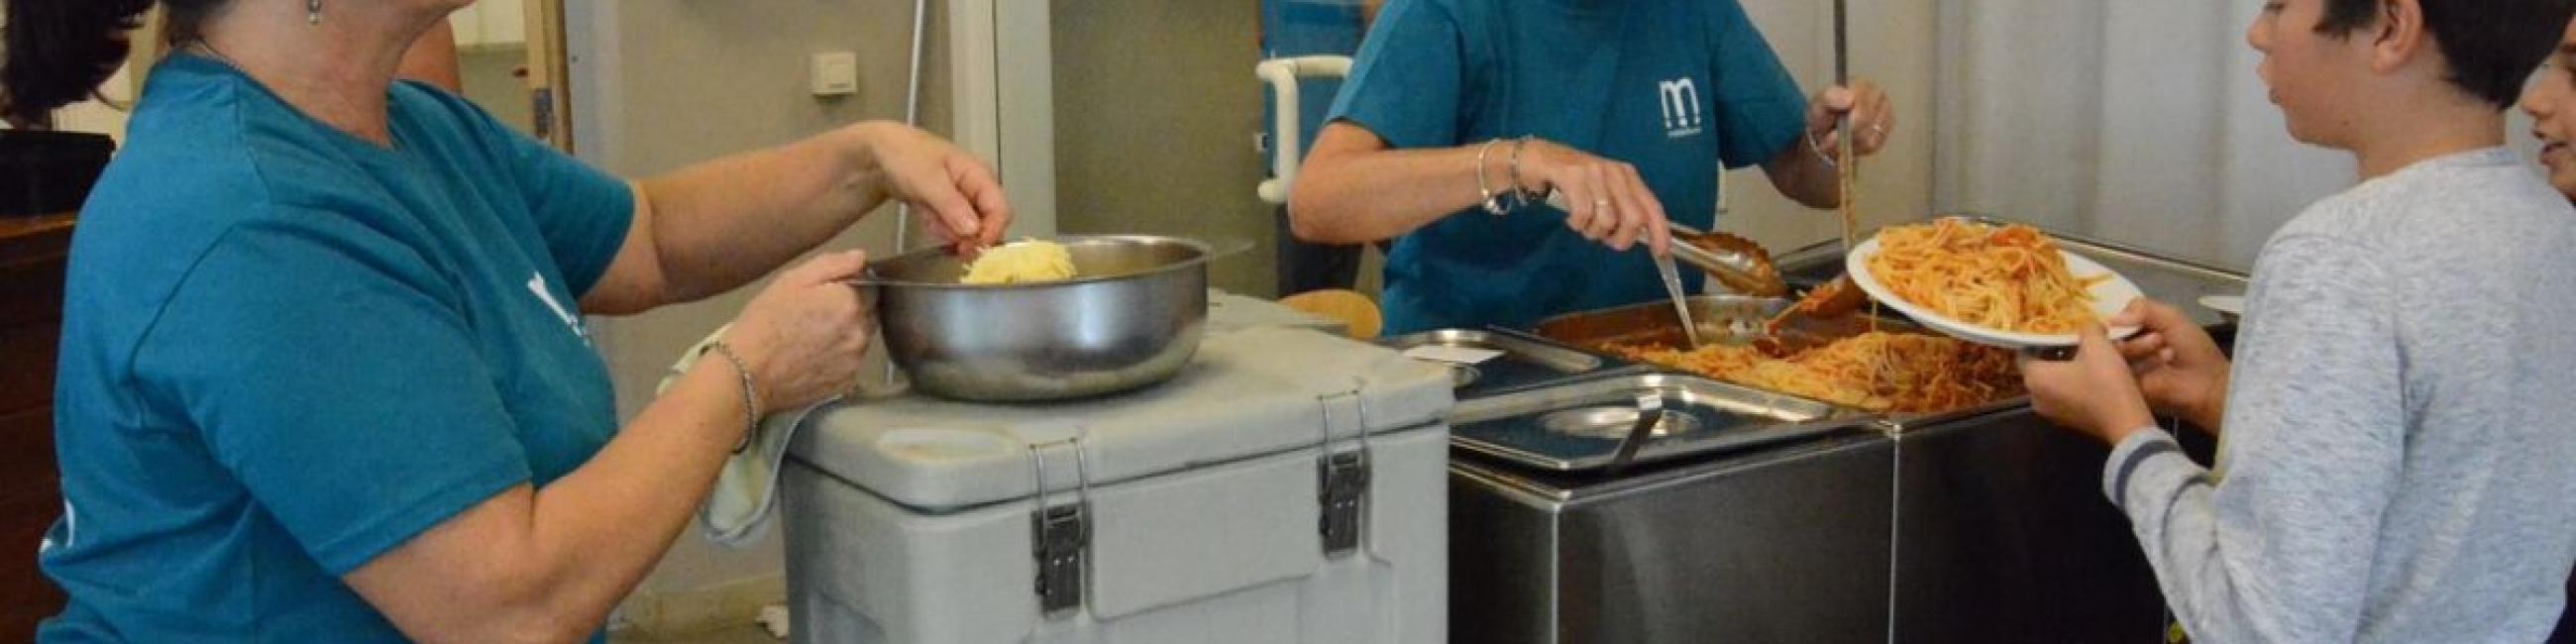 vrijwilligers geven et